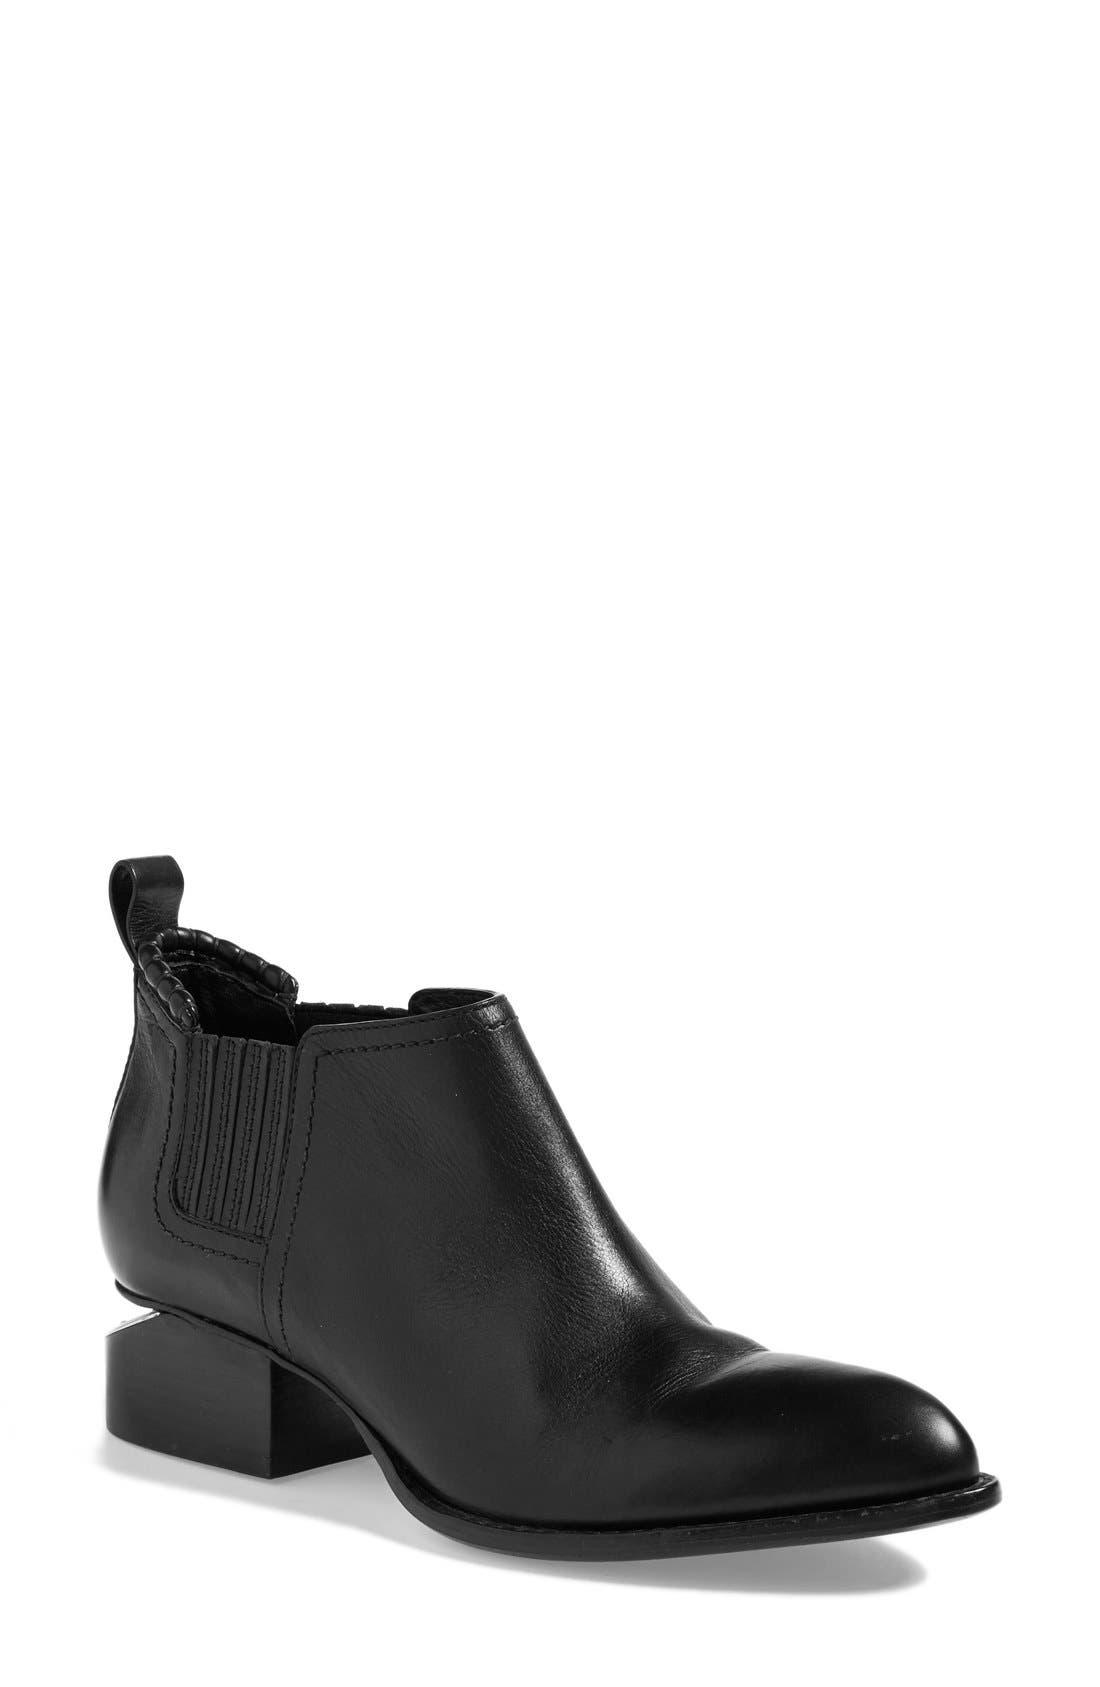 Alternate Image 1 Selected - Alexander Wang Kori Boot (Women)